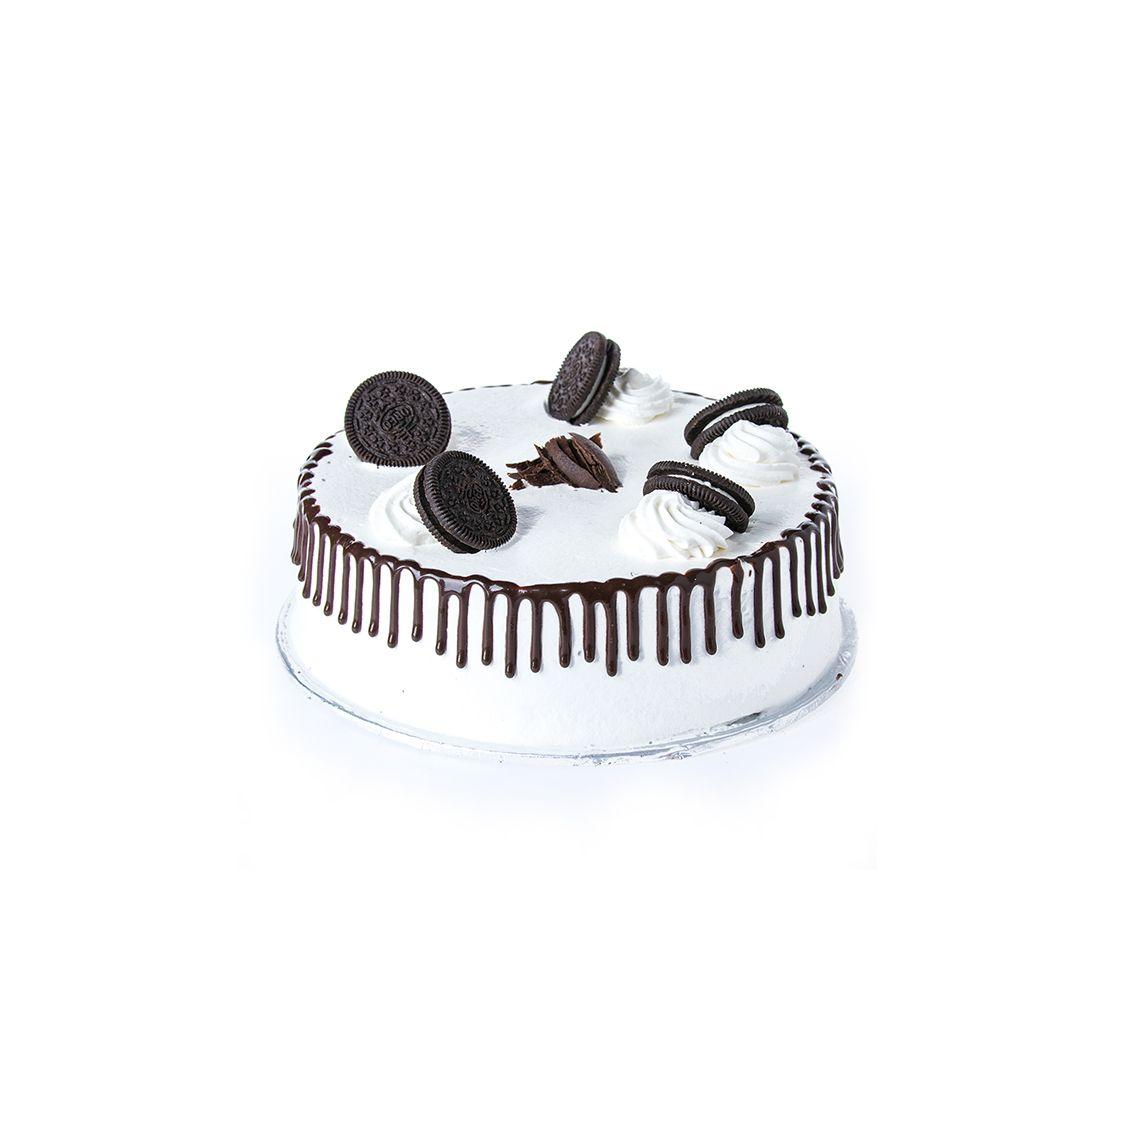 Kitchen Cuisine Default Category Oreo Ice Cream Cake